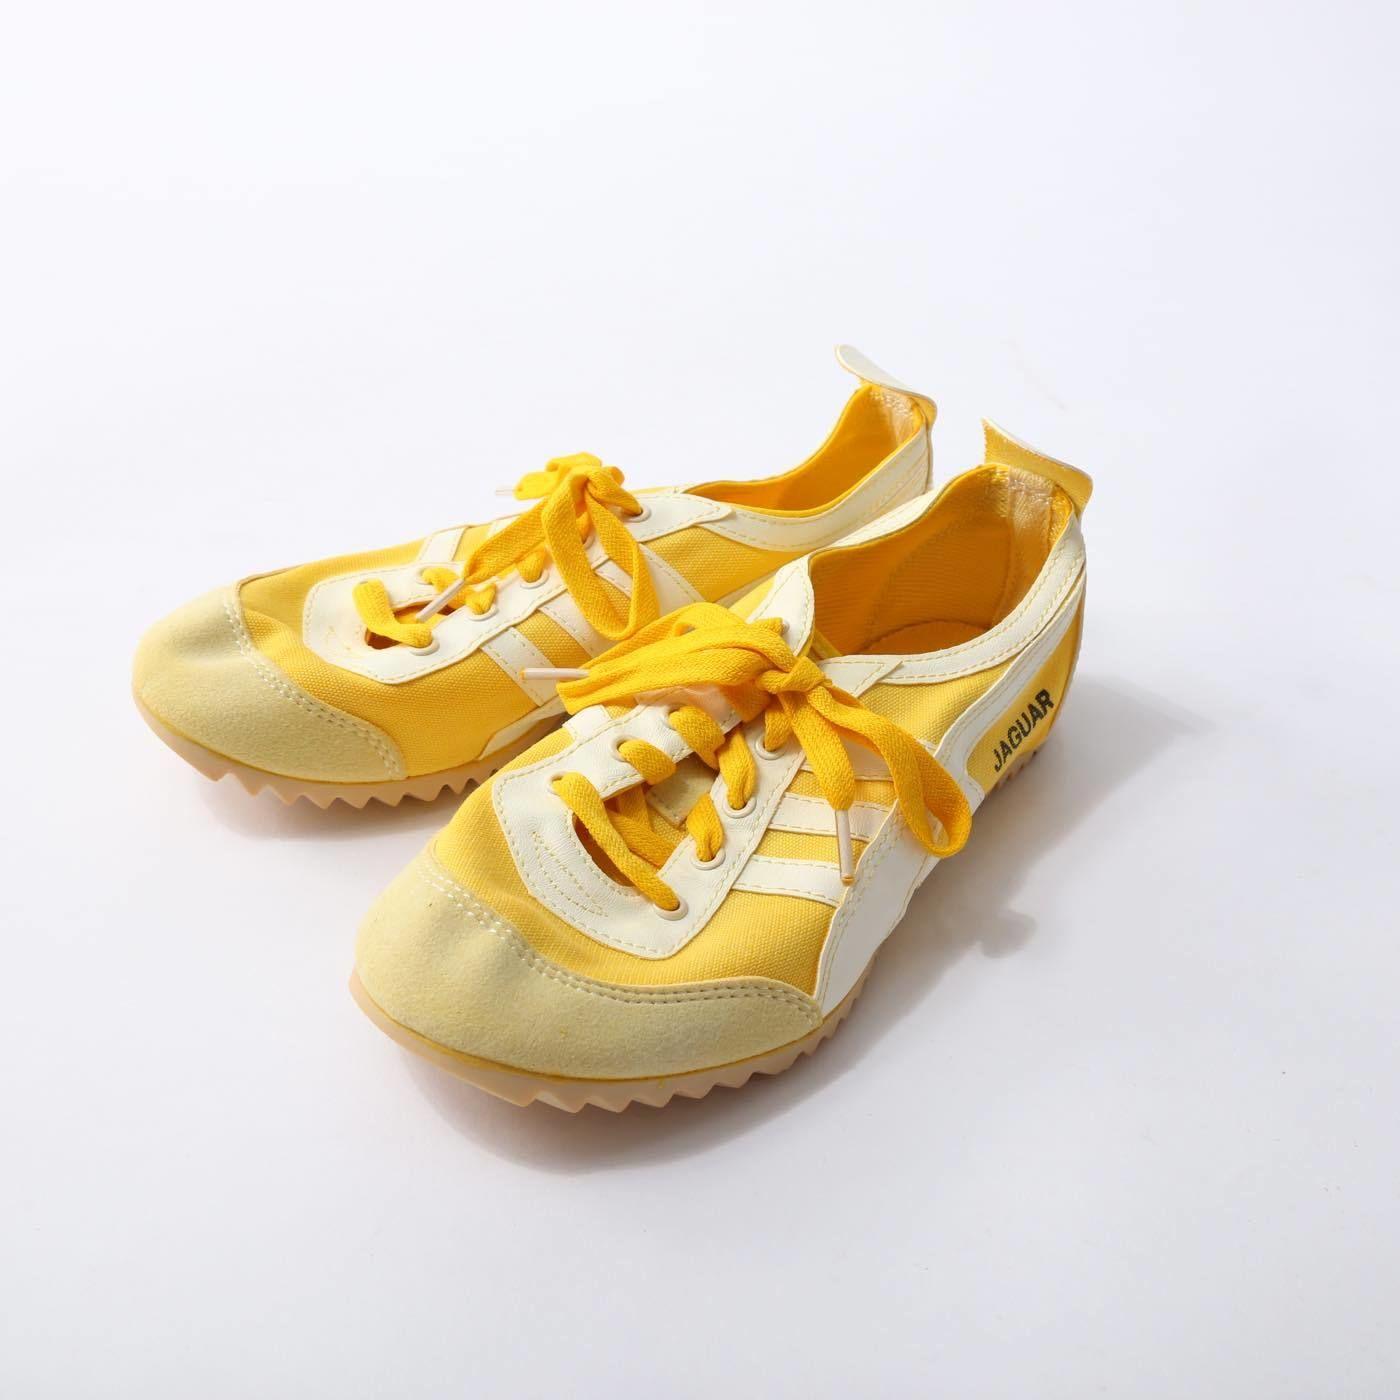 【Product】DYE ita2ra x jaguar スニーカー / yellow